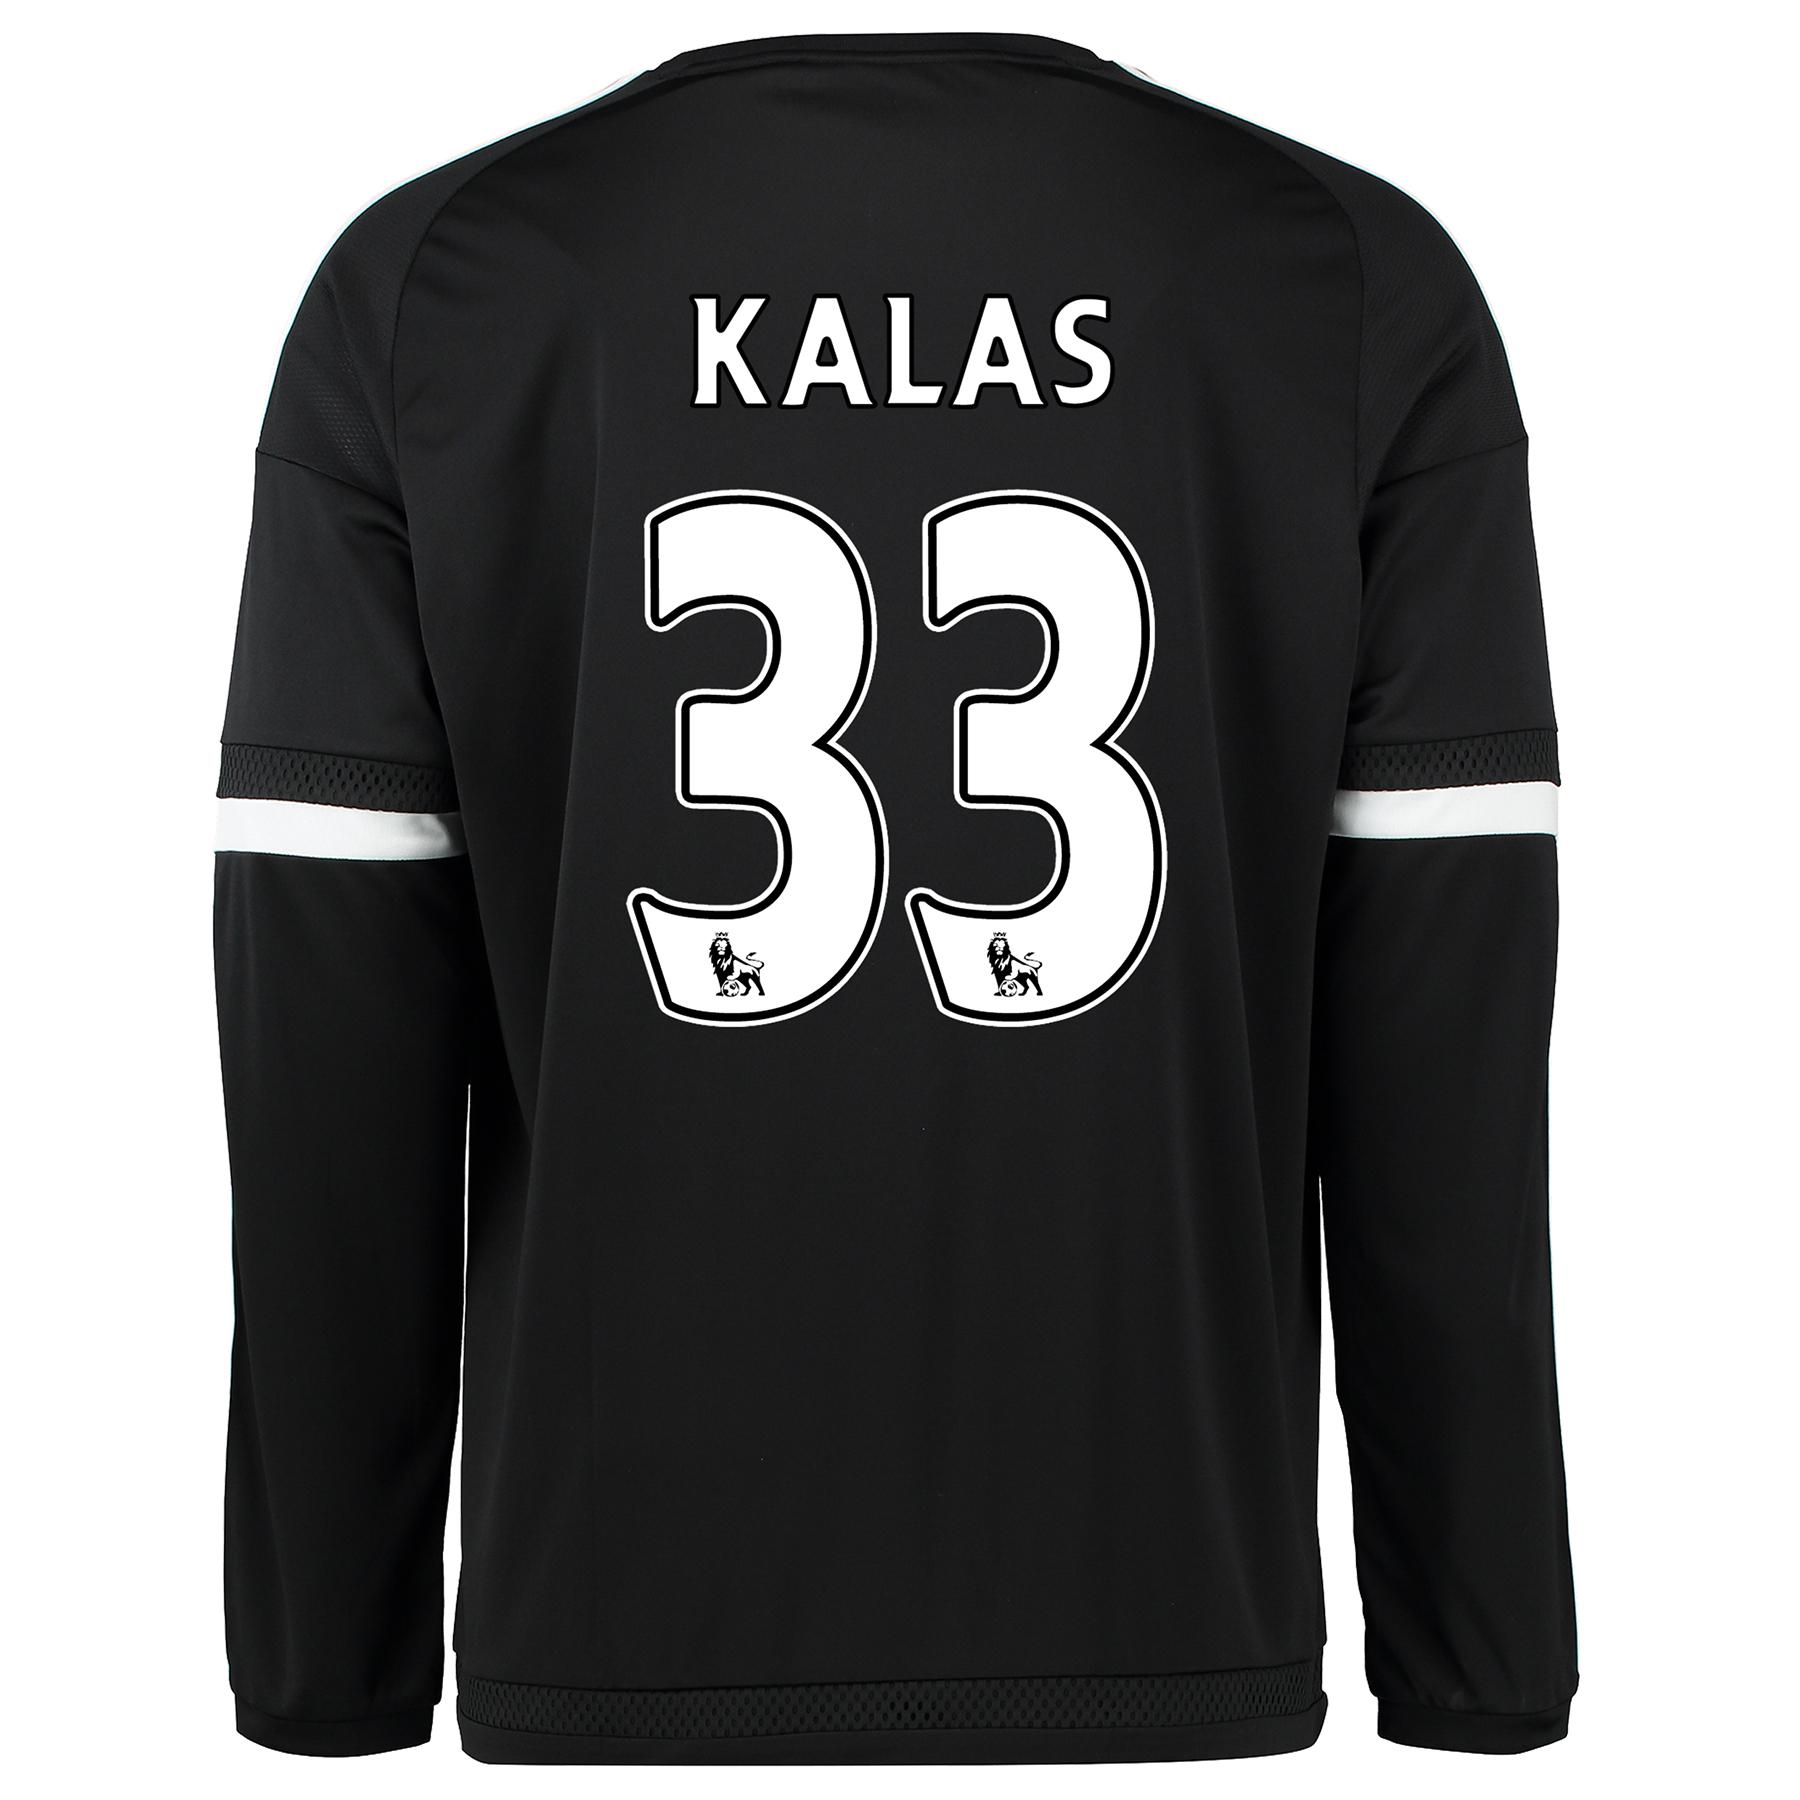 Chelsea Third Shirt 2015/16 - Long Sleeve Black with Kalas 33 printing